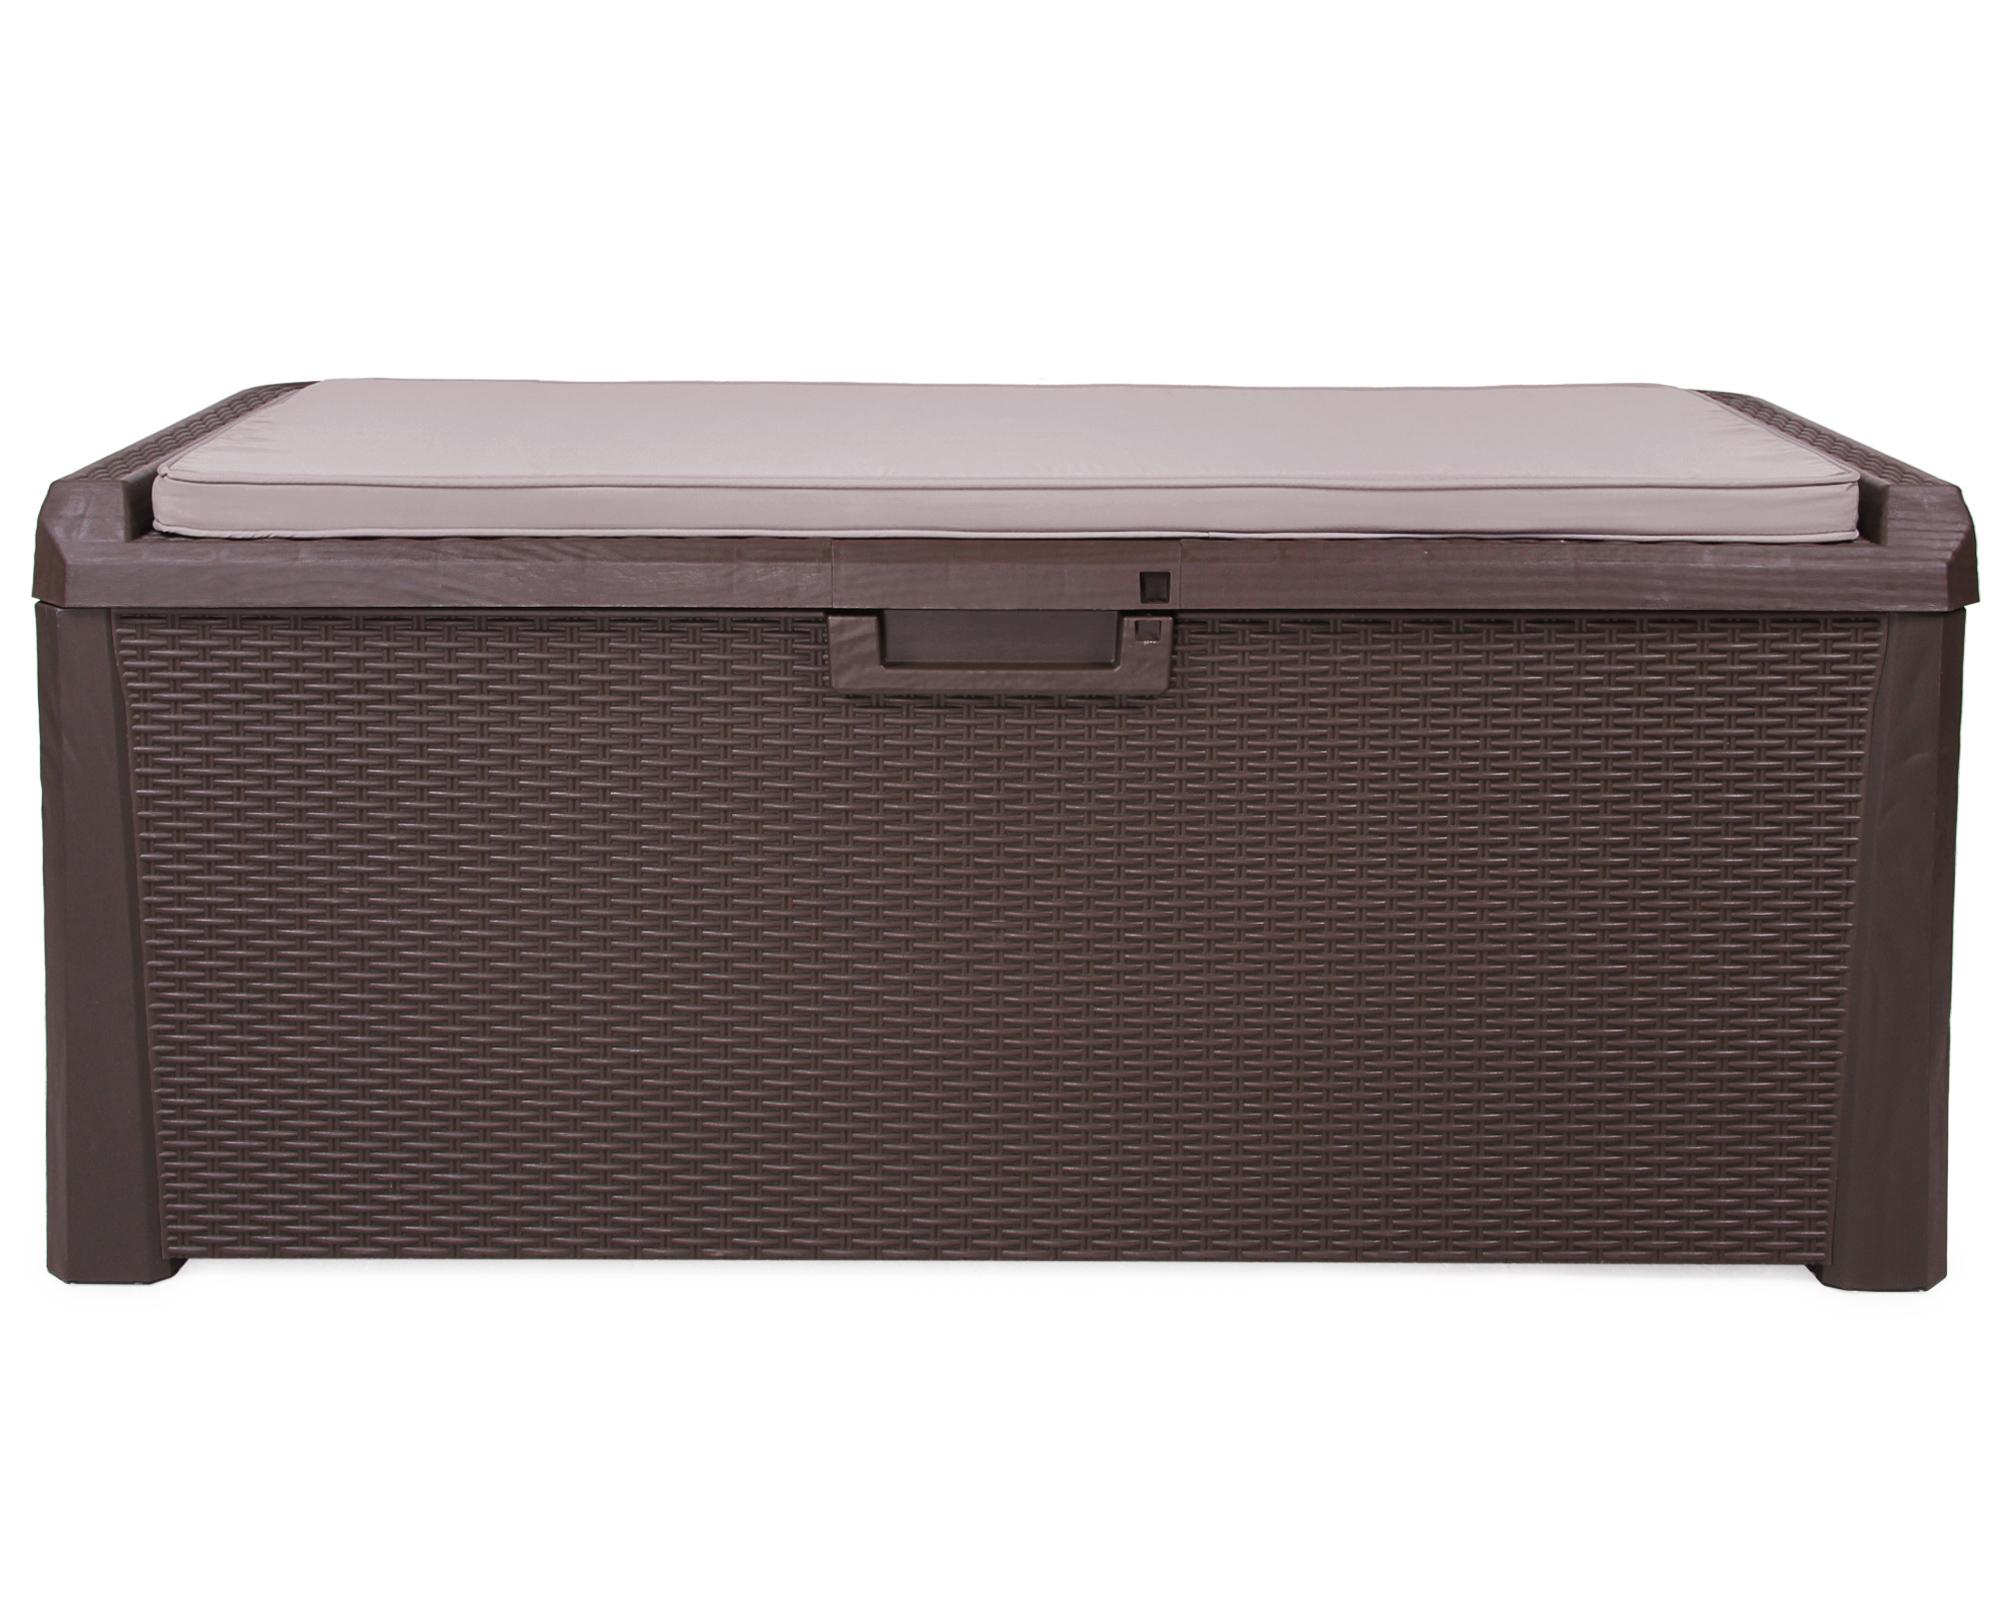 famous auflagenbox rattan braun qz34 kyushucon. Black Bedroom Furniture Sets. Home Design Ideas